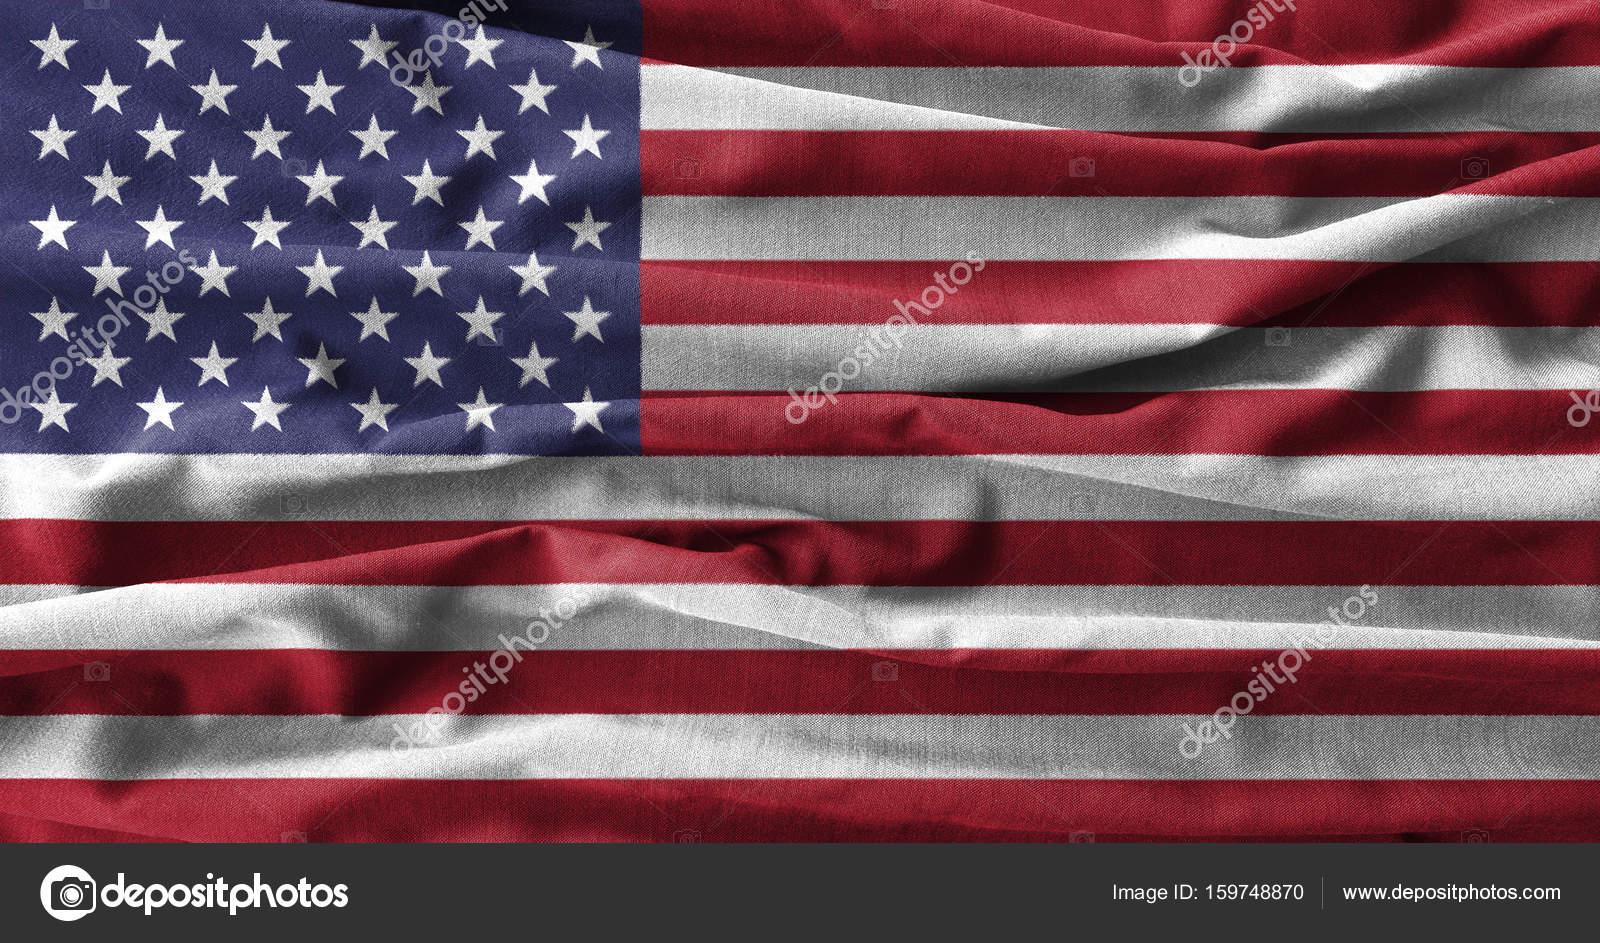 Amerikan Bayrağı Boyama Dalga Pamuk Kumaş Yüksek Detay Stok Foto